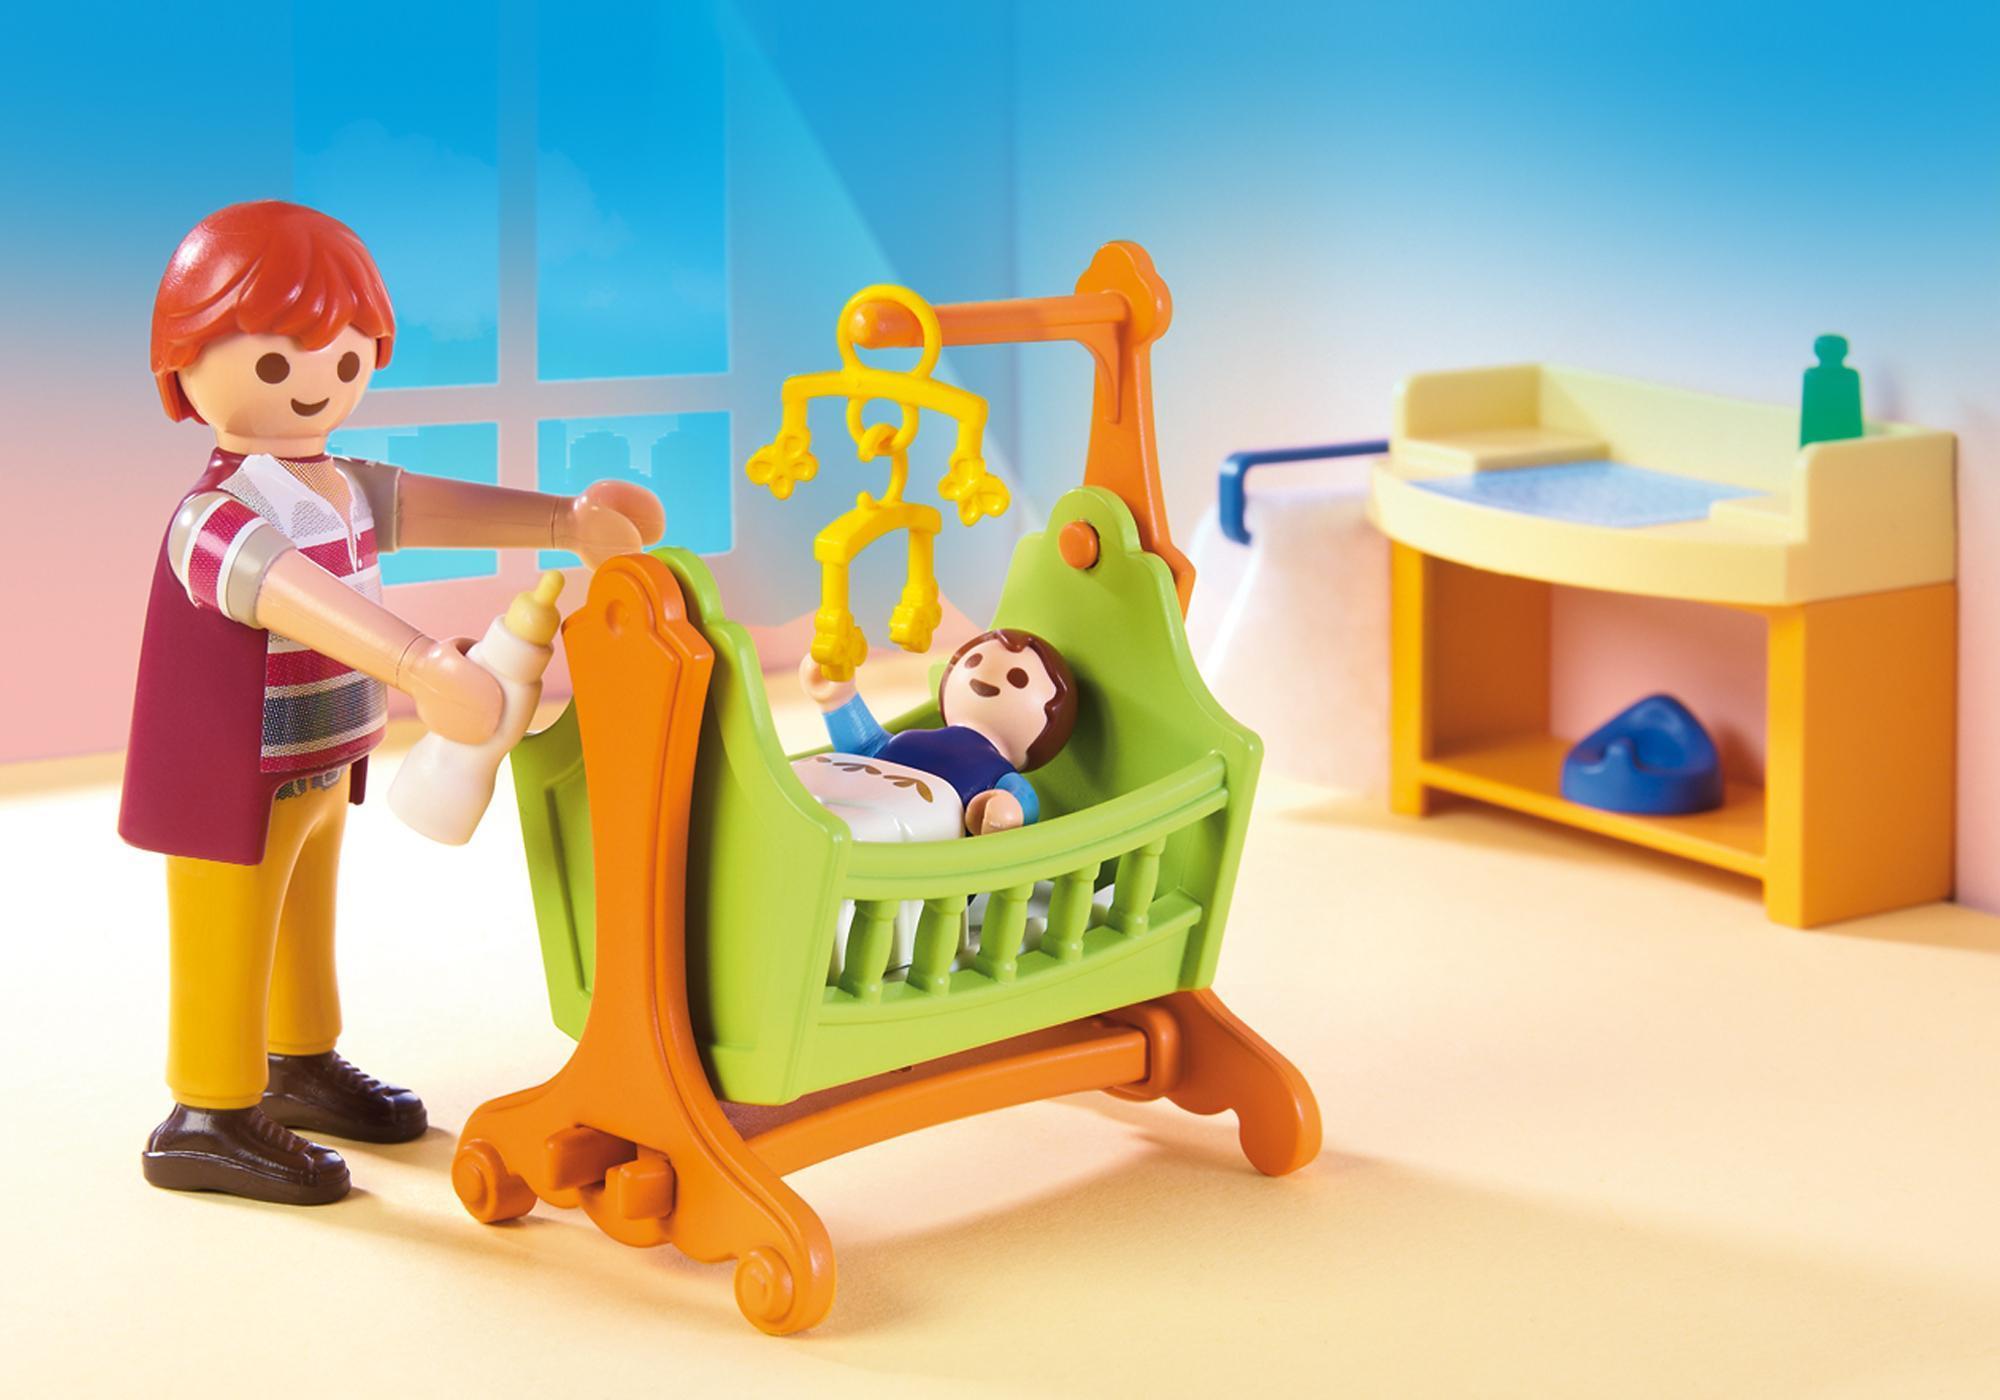 http://media.playmobil.com/i/playmobil/5304_product_extra1/Chambre de bébé